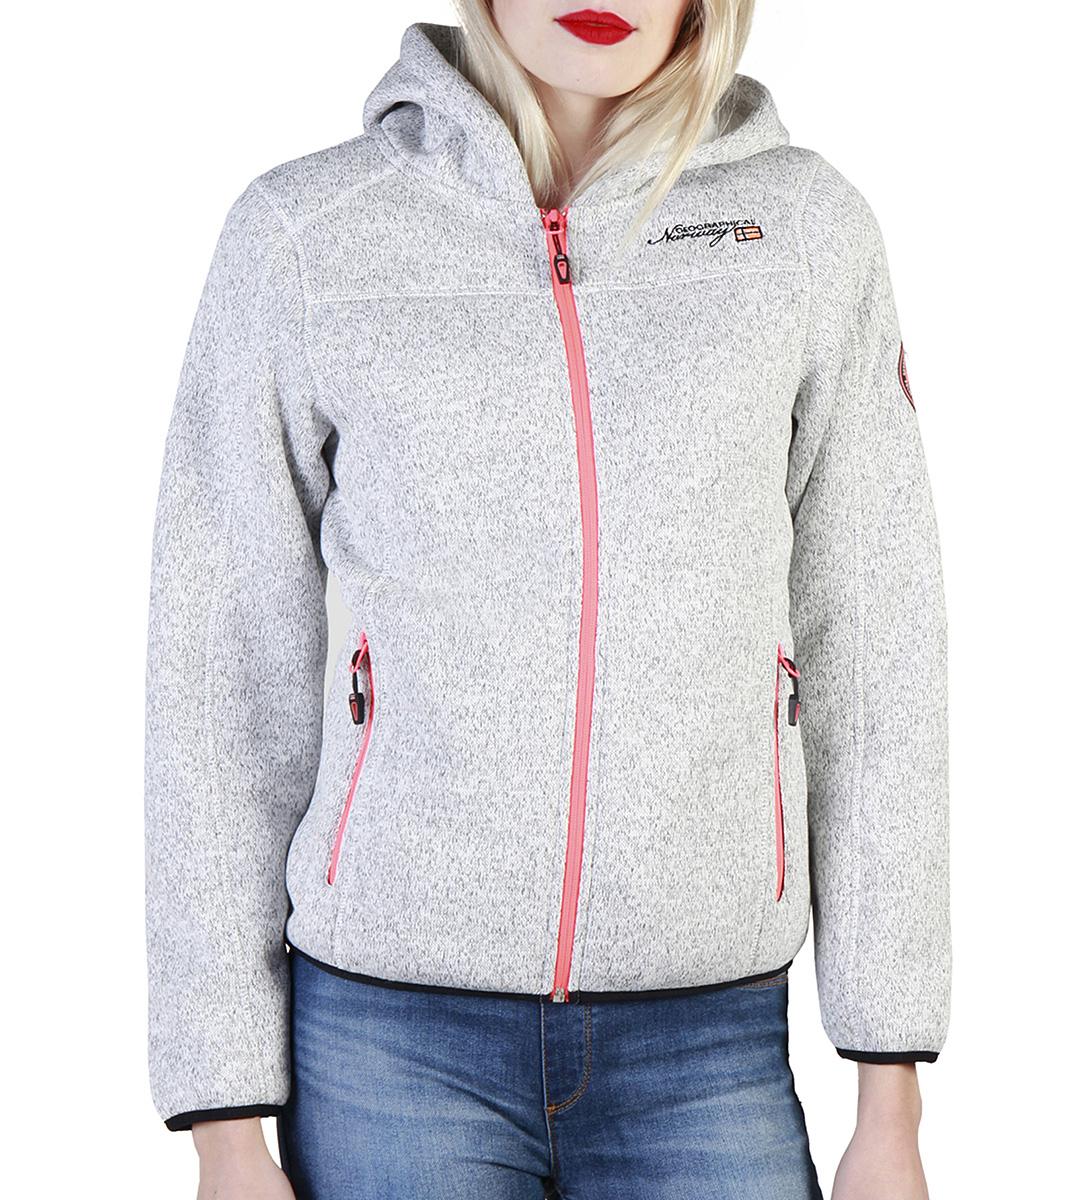 6a849090d4 Geographical Norway Torche női cipzáros kapucnis pulóver - Dressa.hu